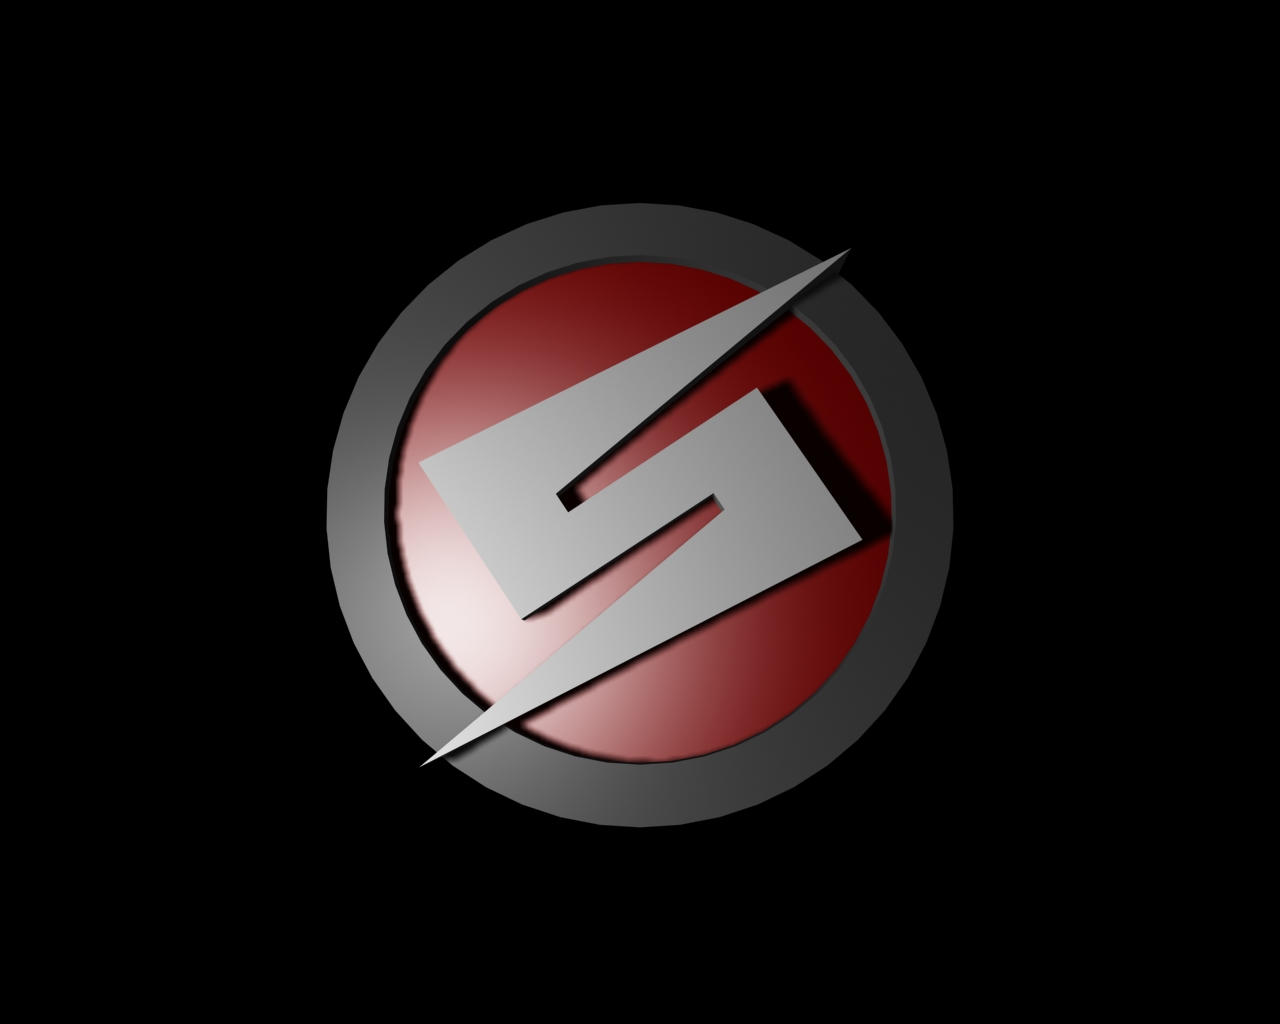 Metroid Prime Logo by loser-cu on deviantART